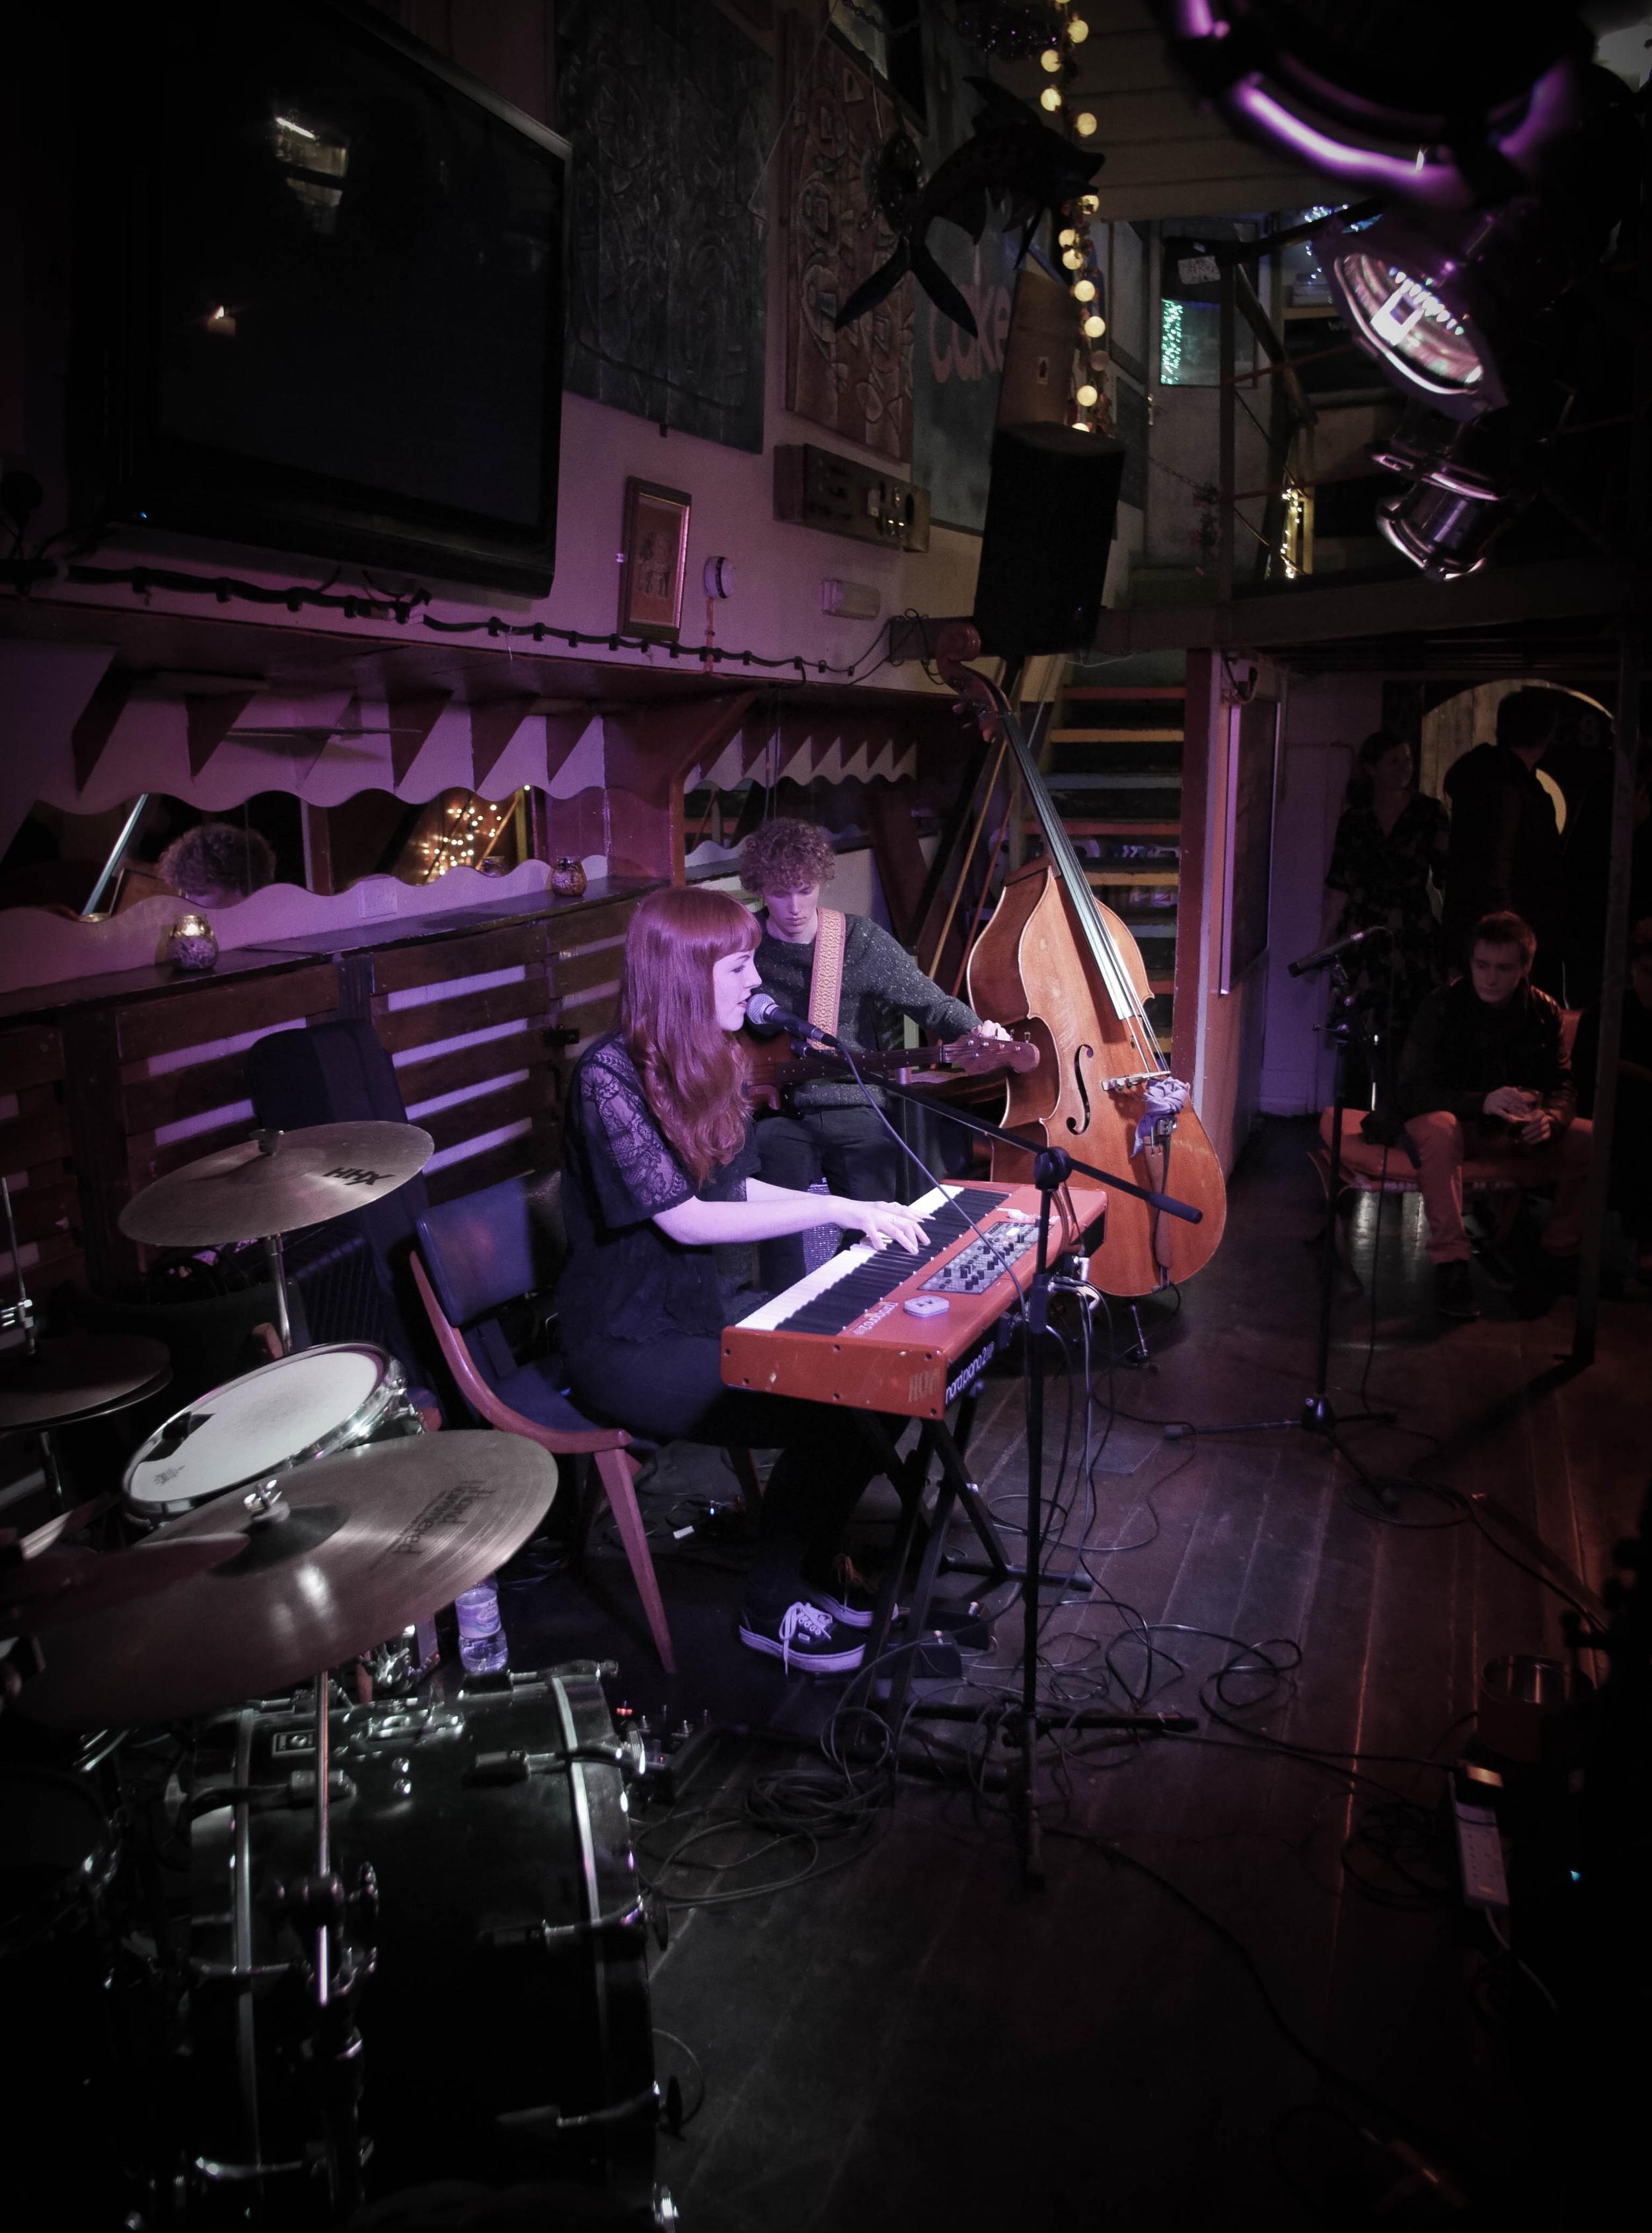 Concerts at the Tamesis Dock